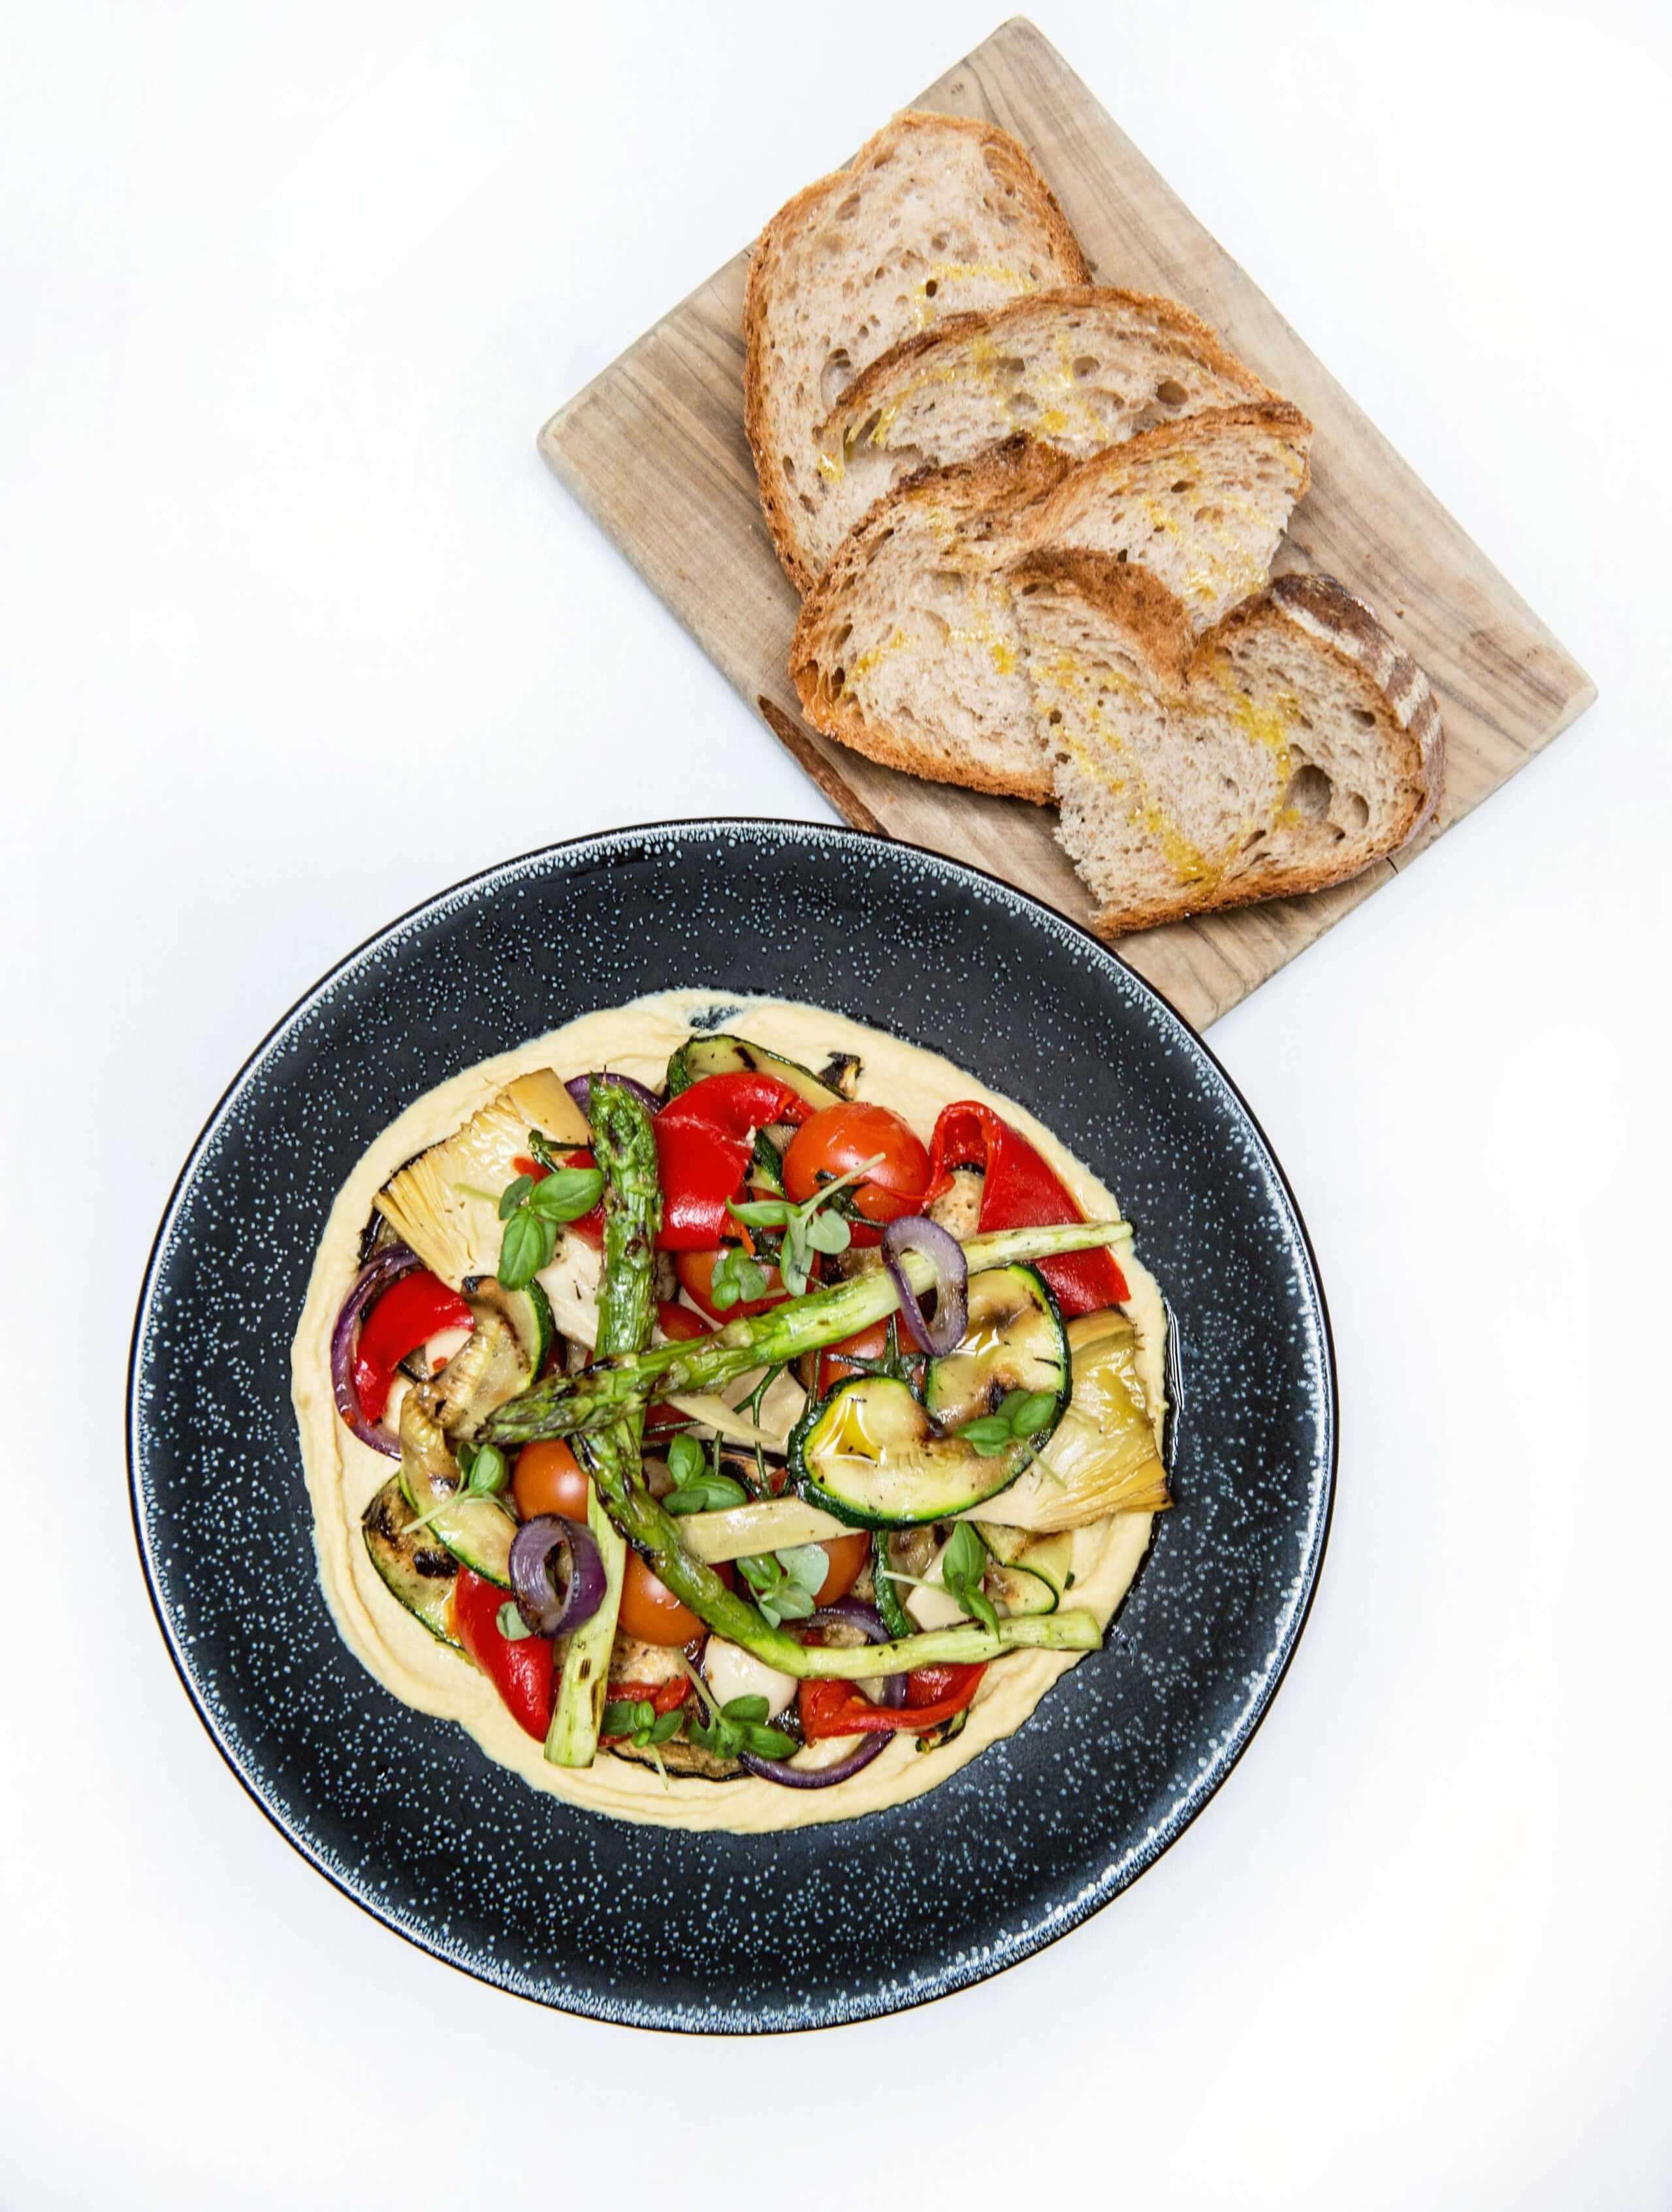 108 Brasserie - Josper grilled vegetable plate 1